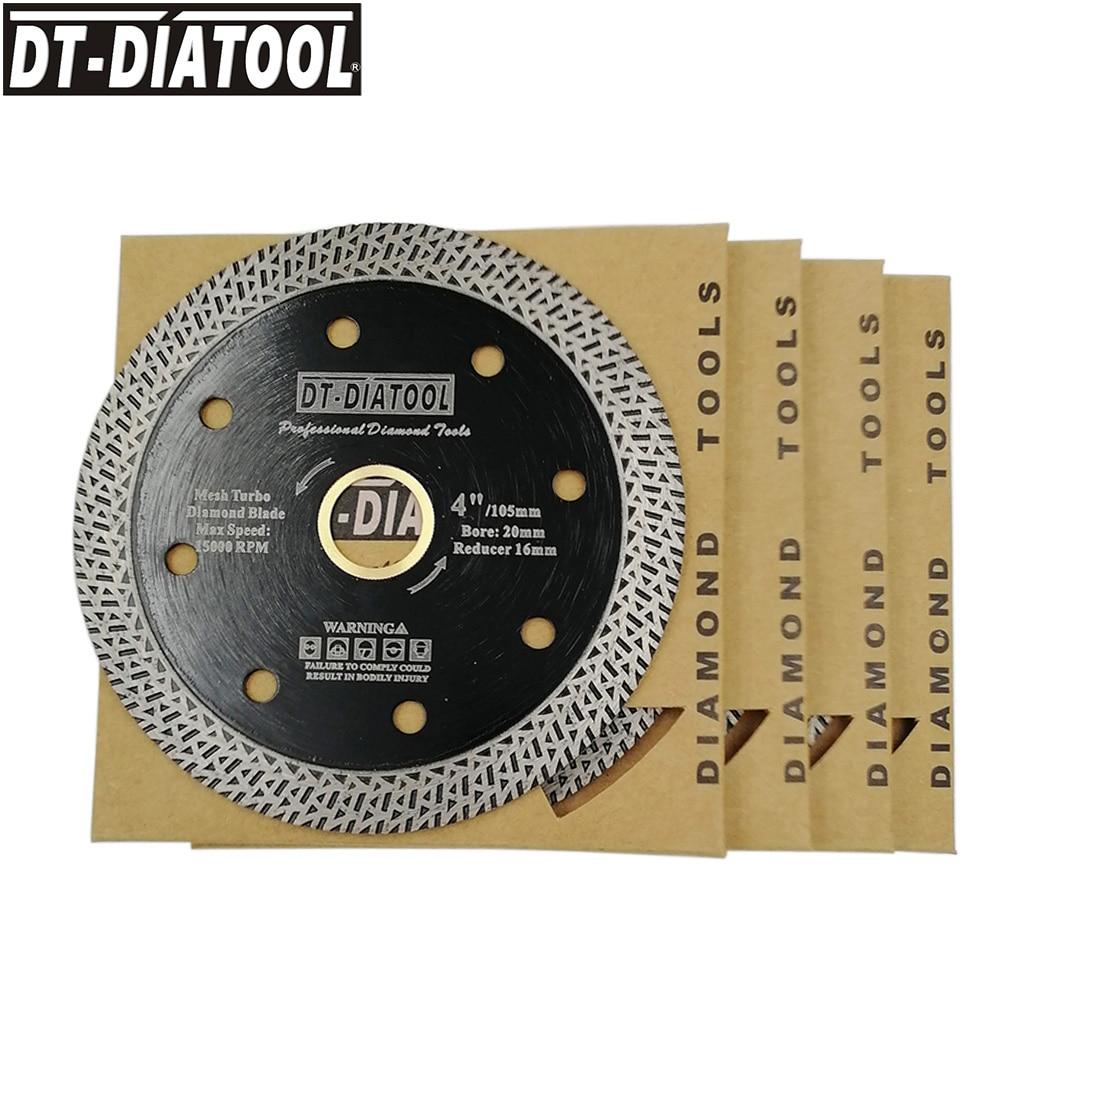 DT-DIATOOL 5 pcs Diameter 105mm Dry or wet Hot-pressed sintered Diamond Cutting Disc With Mesh Turbo Rim Segment 4inch Saw Blade